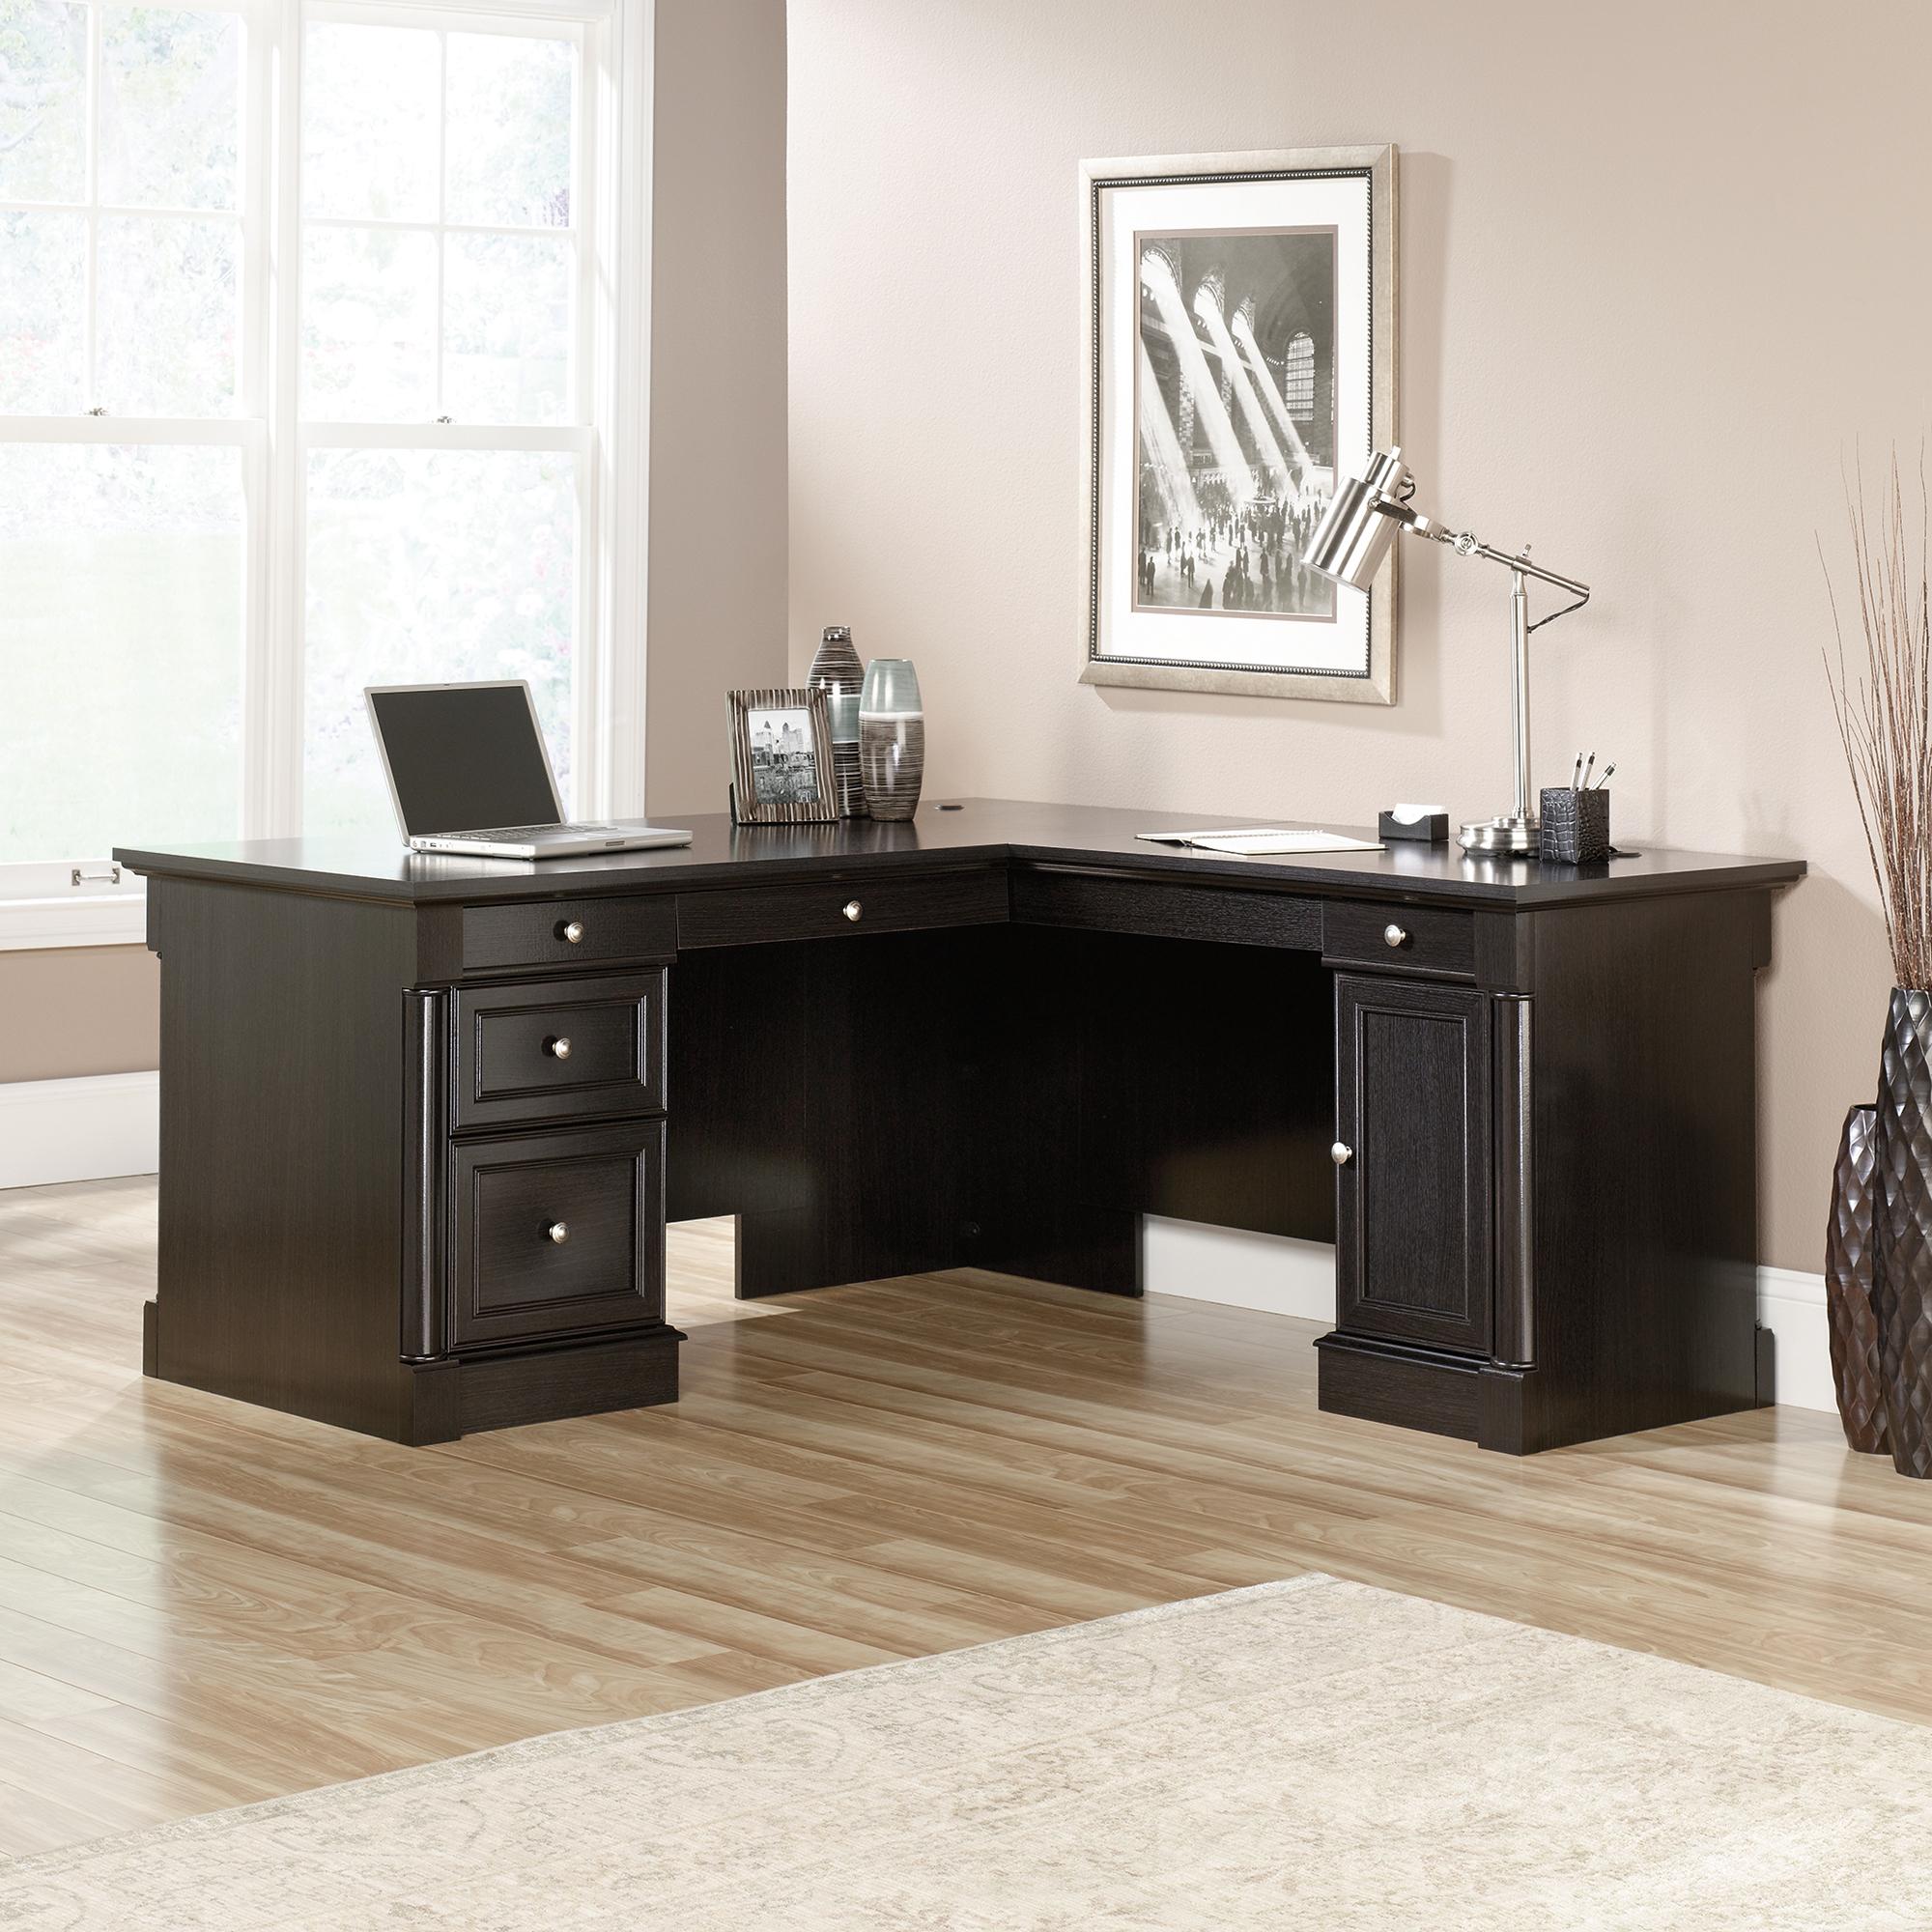 l-shaped desk l-shaped desk QPQXHGS